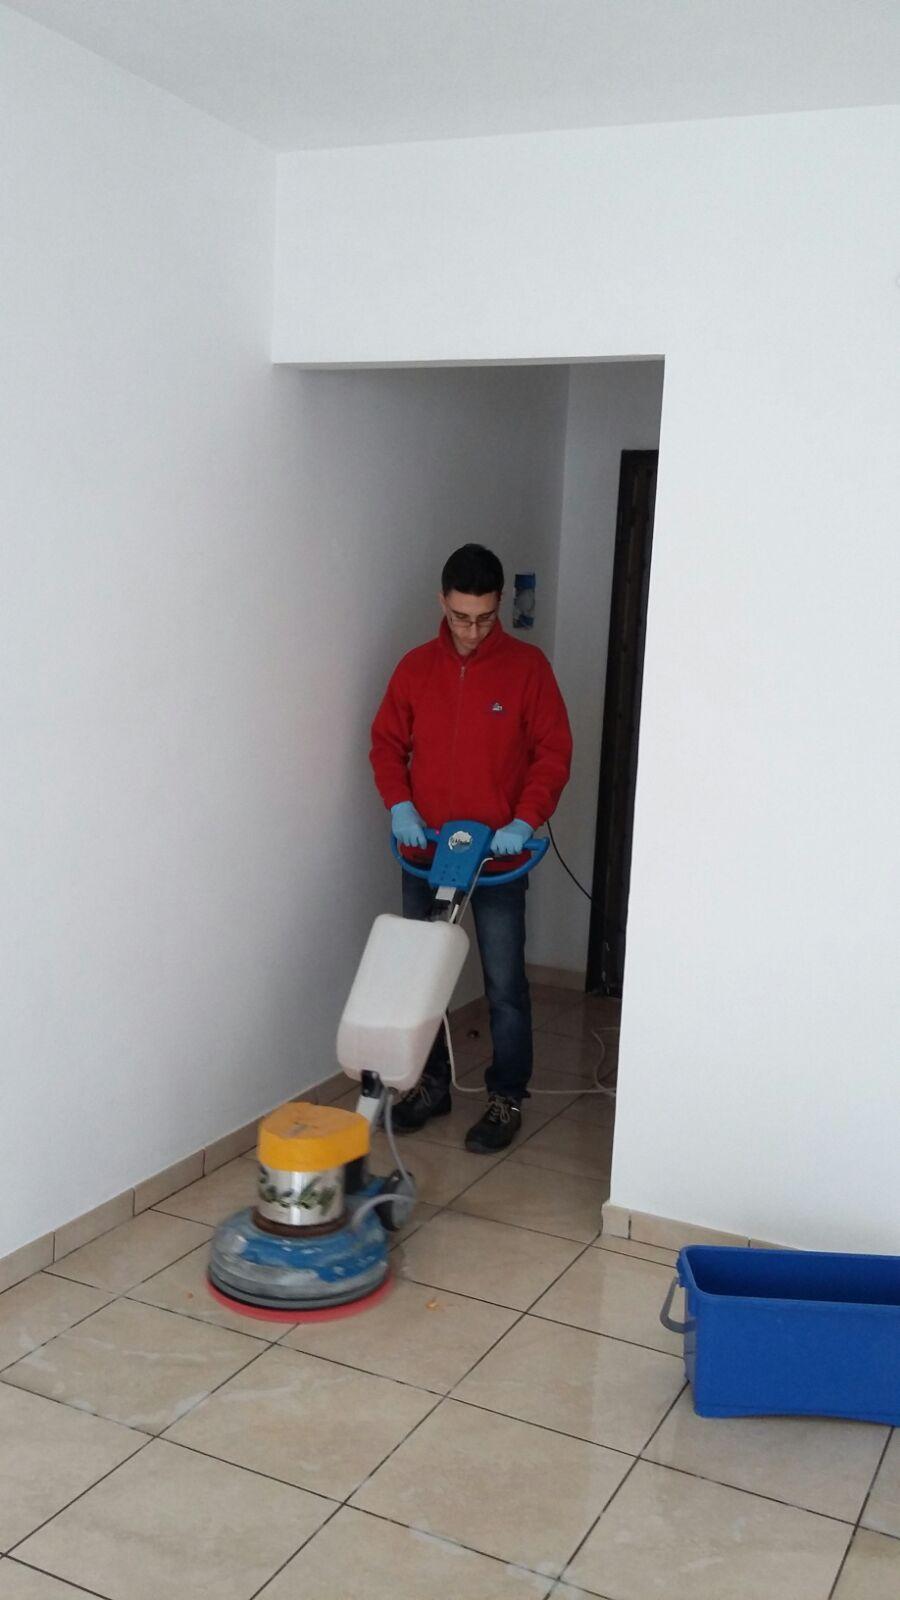 pulizia pavimento con monospazzola